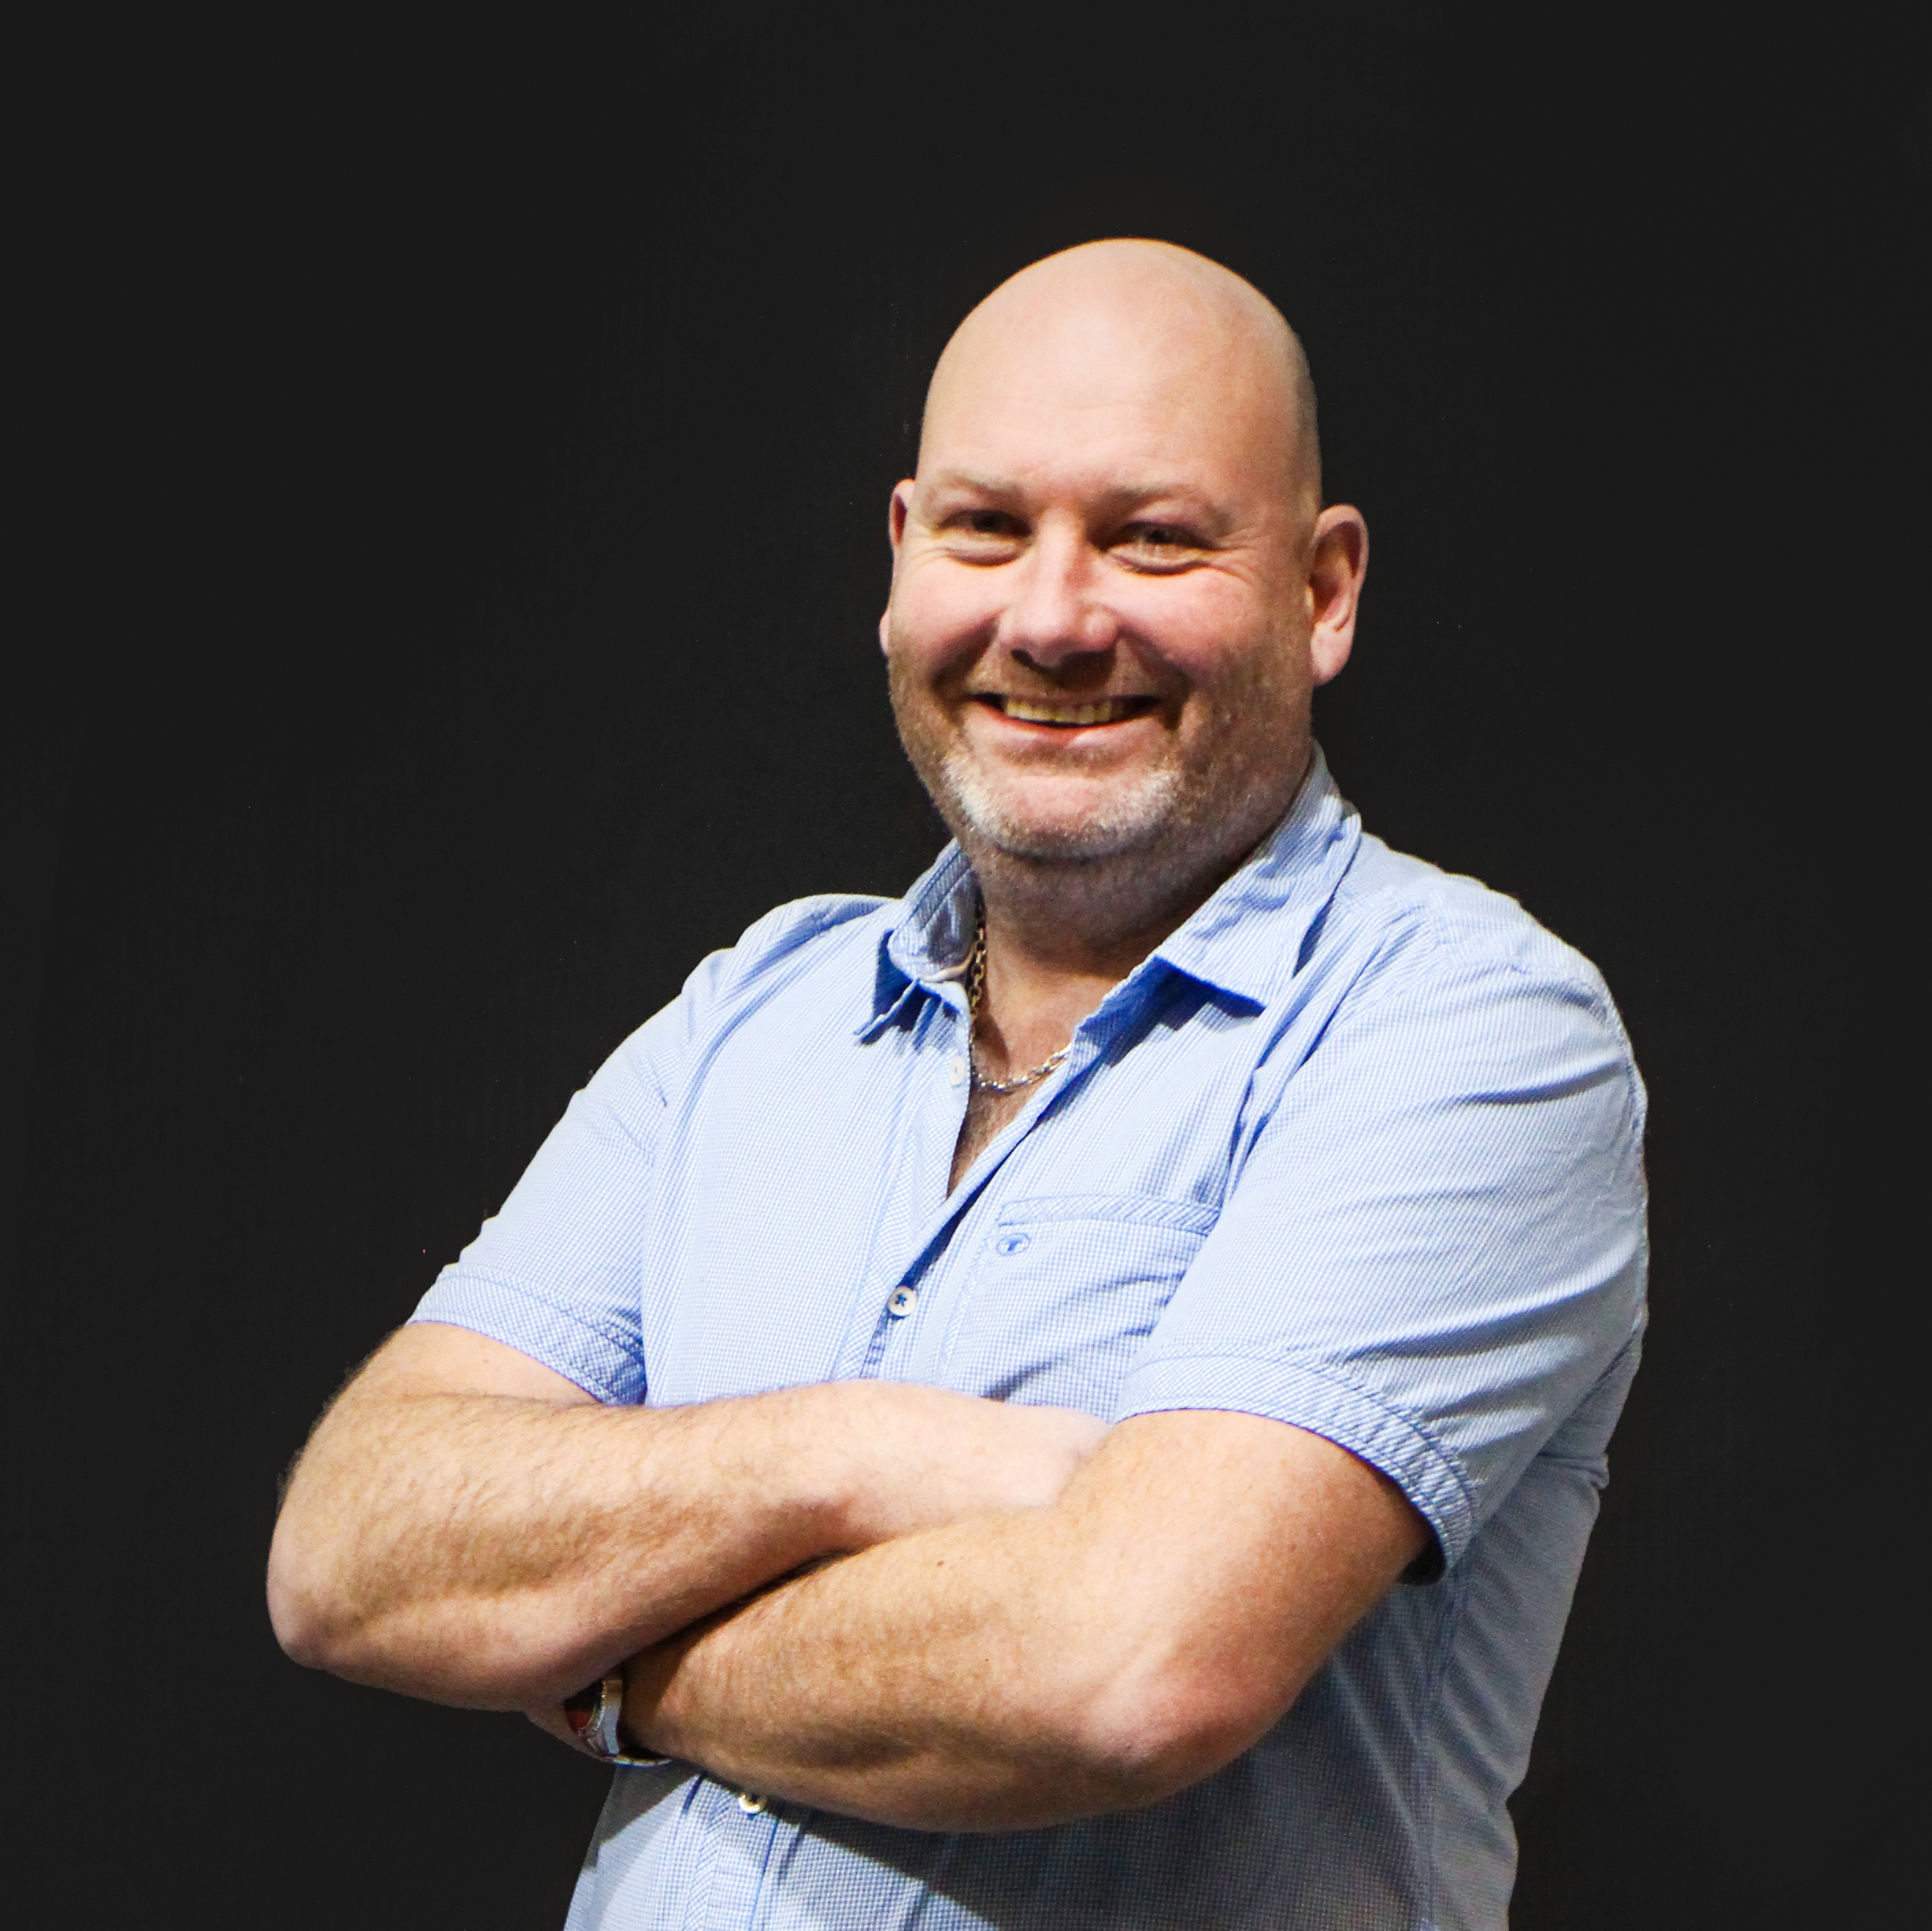 Rune Kristiansen - logisitkk hos Ådalen Truck AS